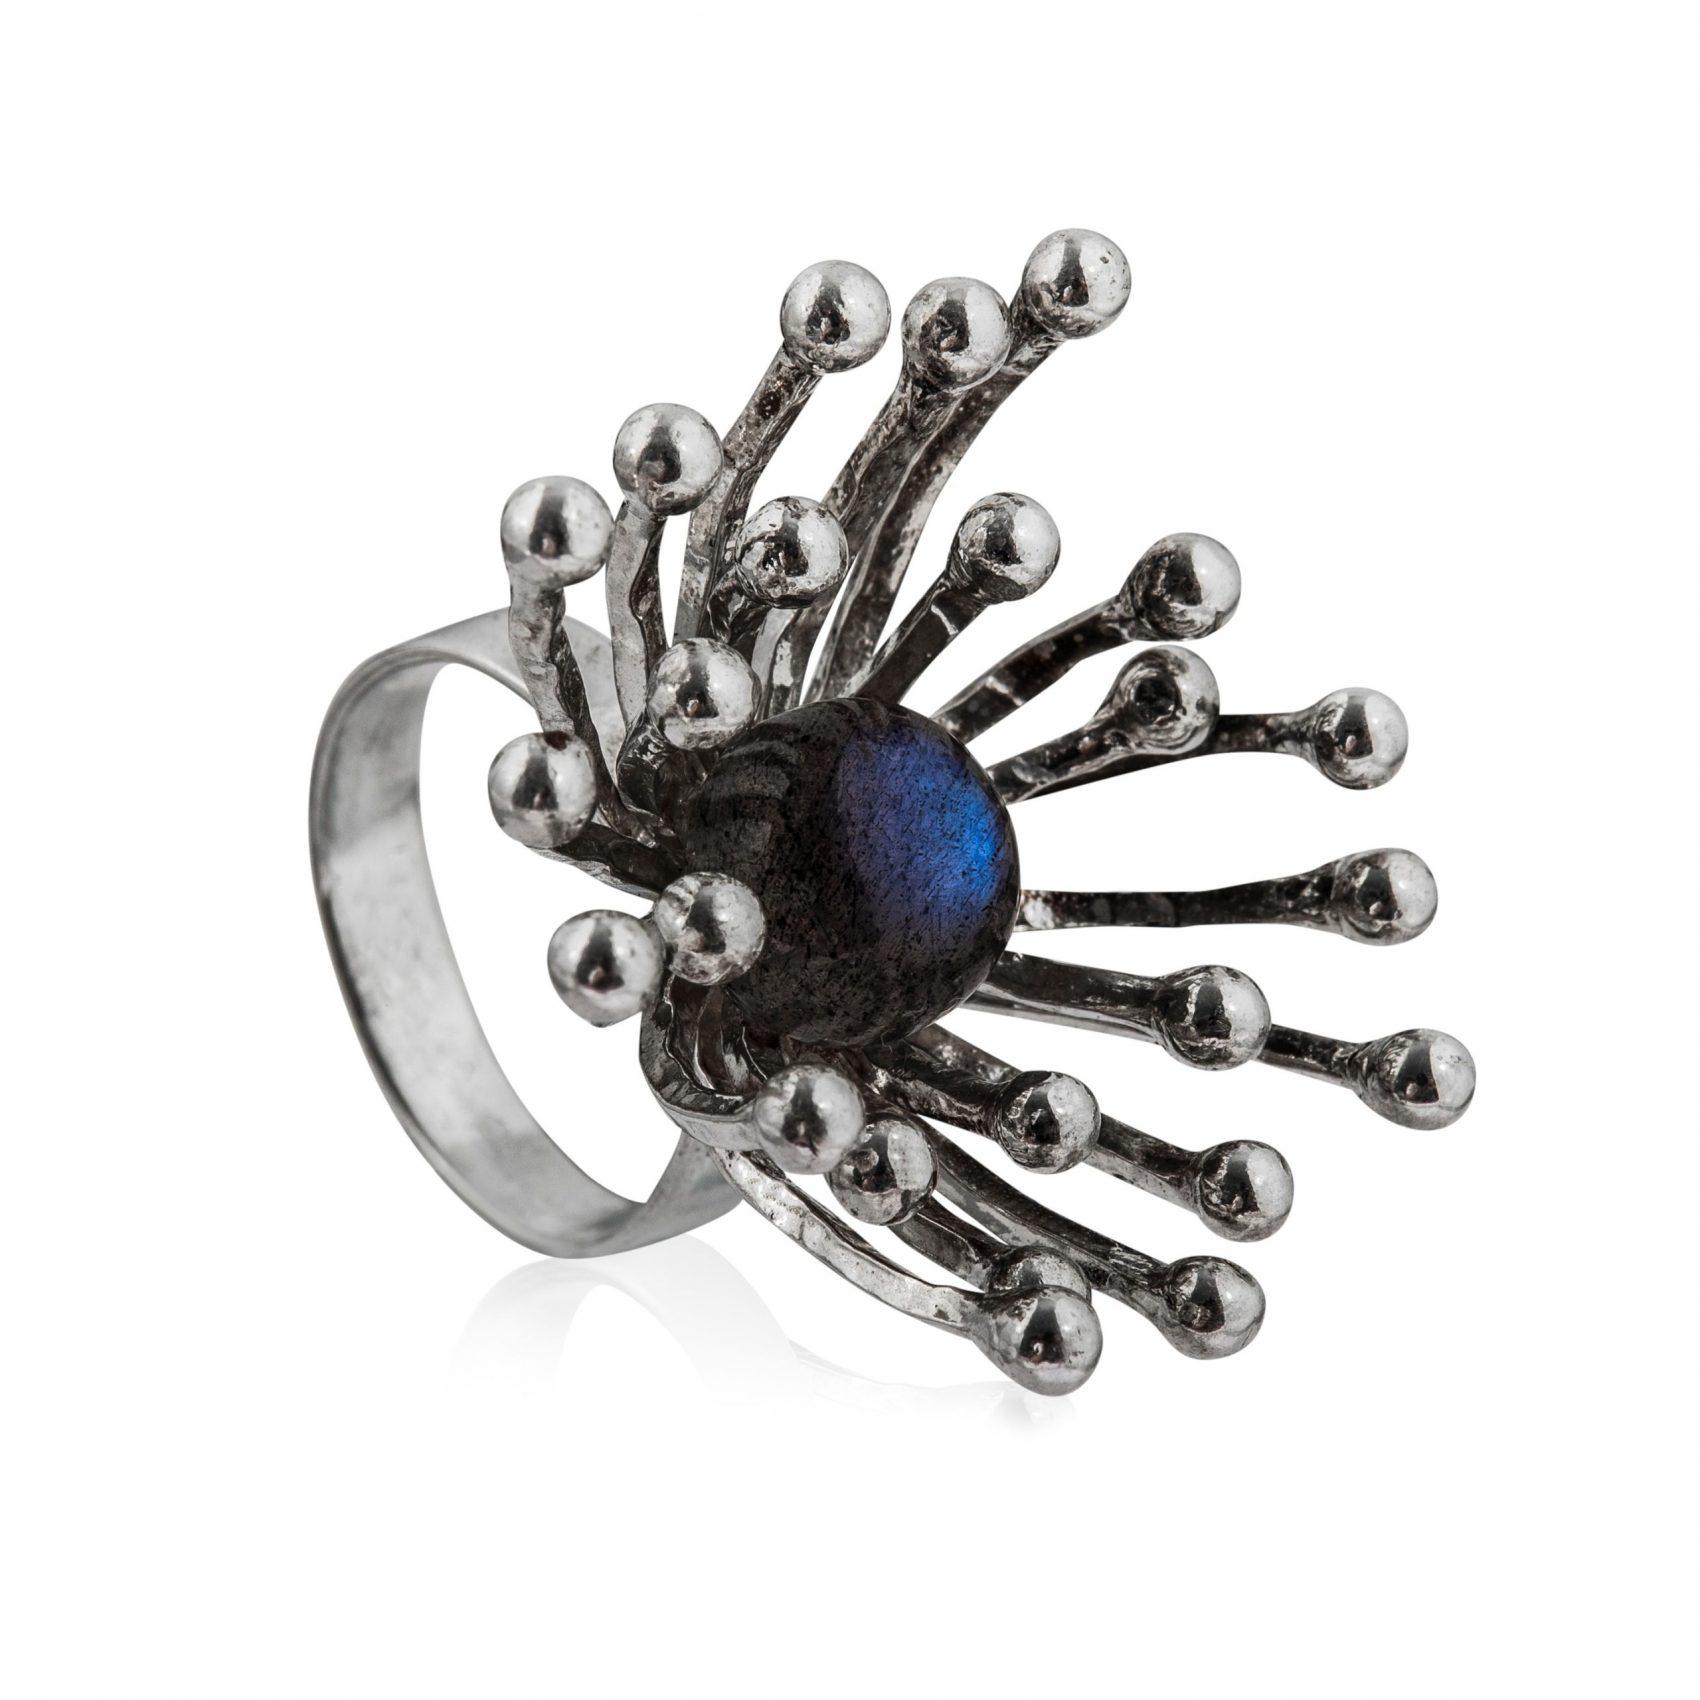 Gaia Jewels - Søanemone, ring